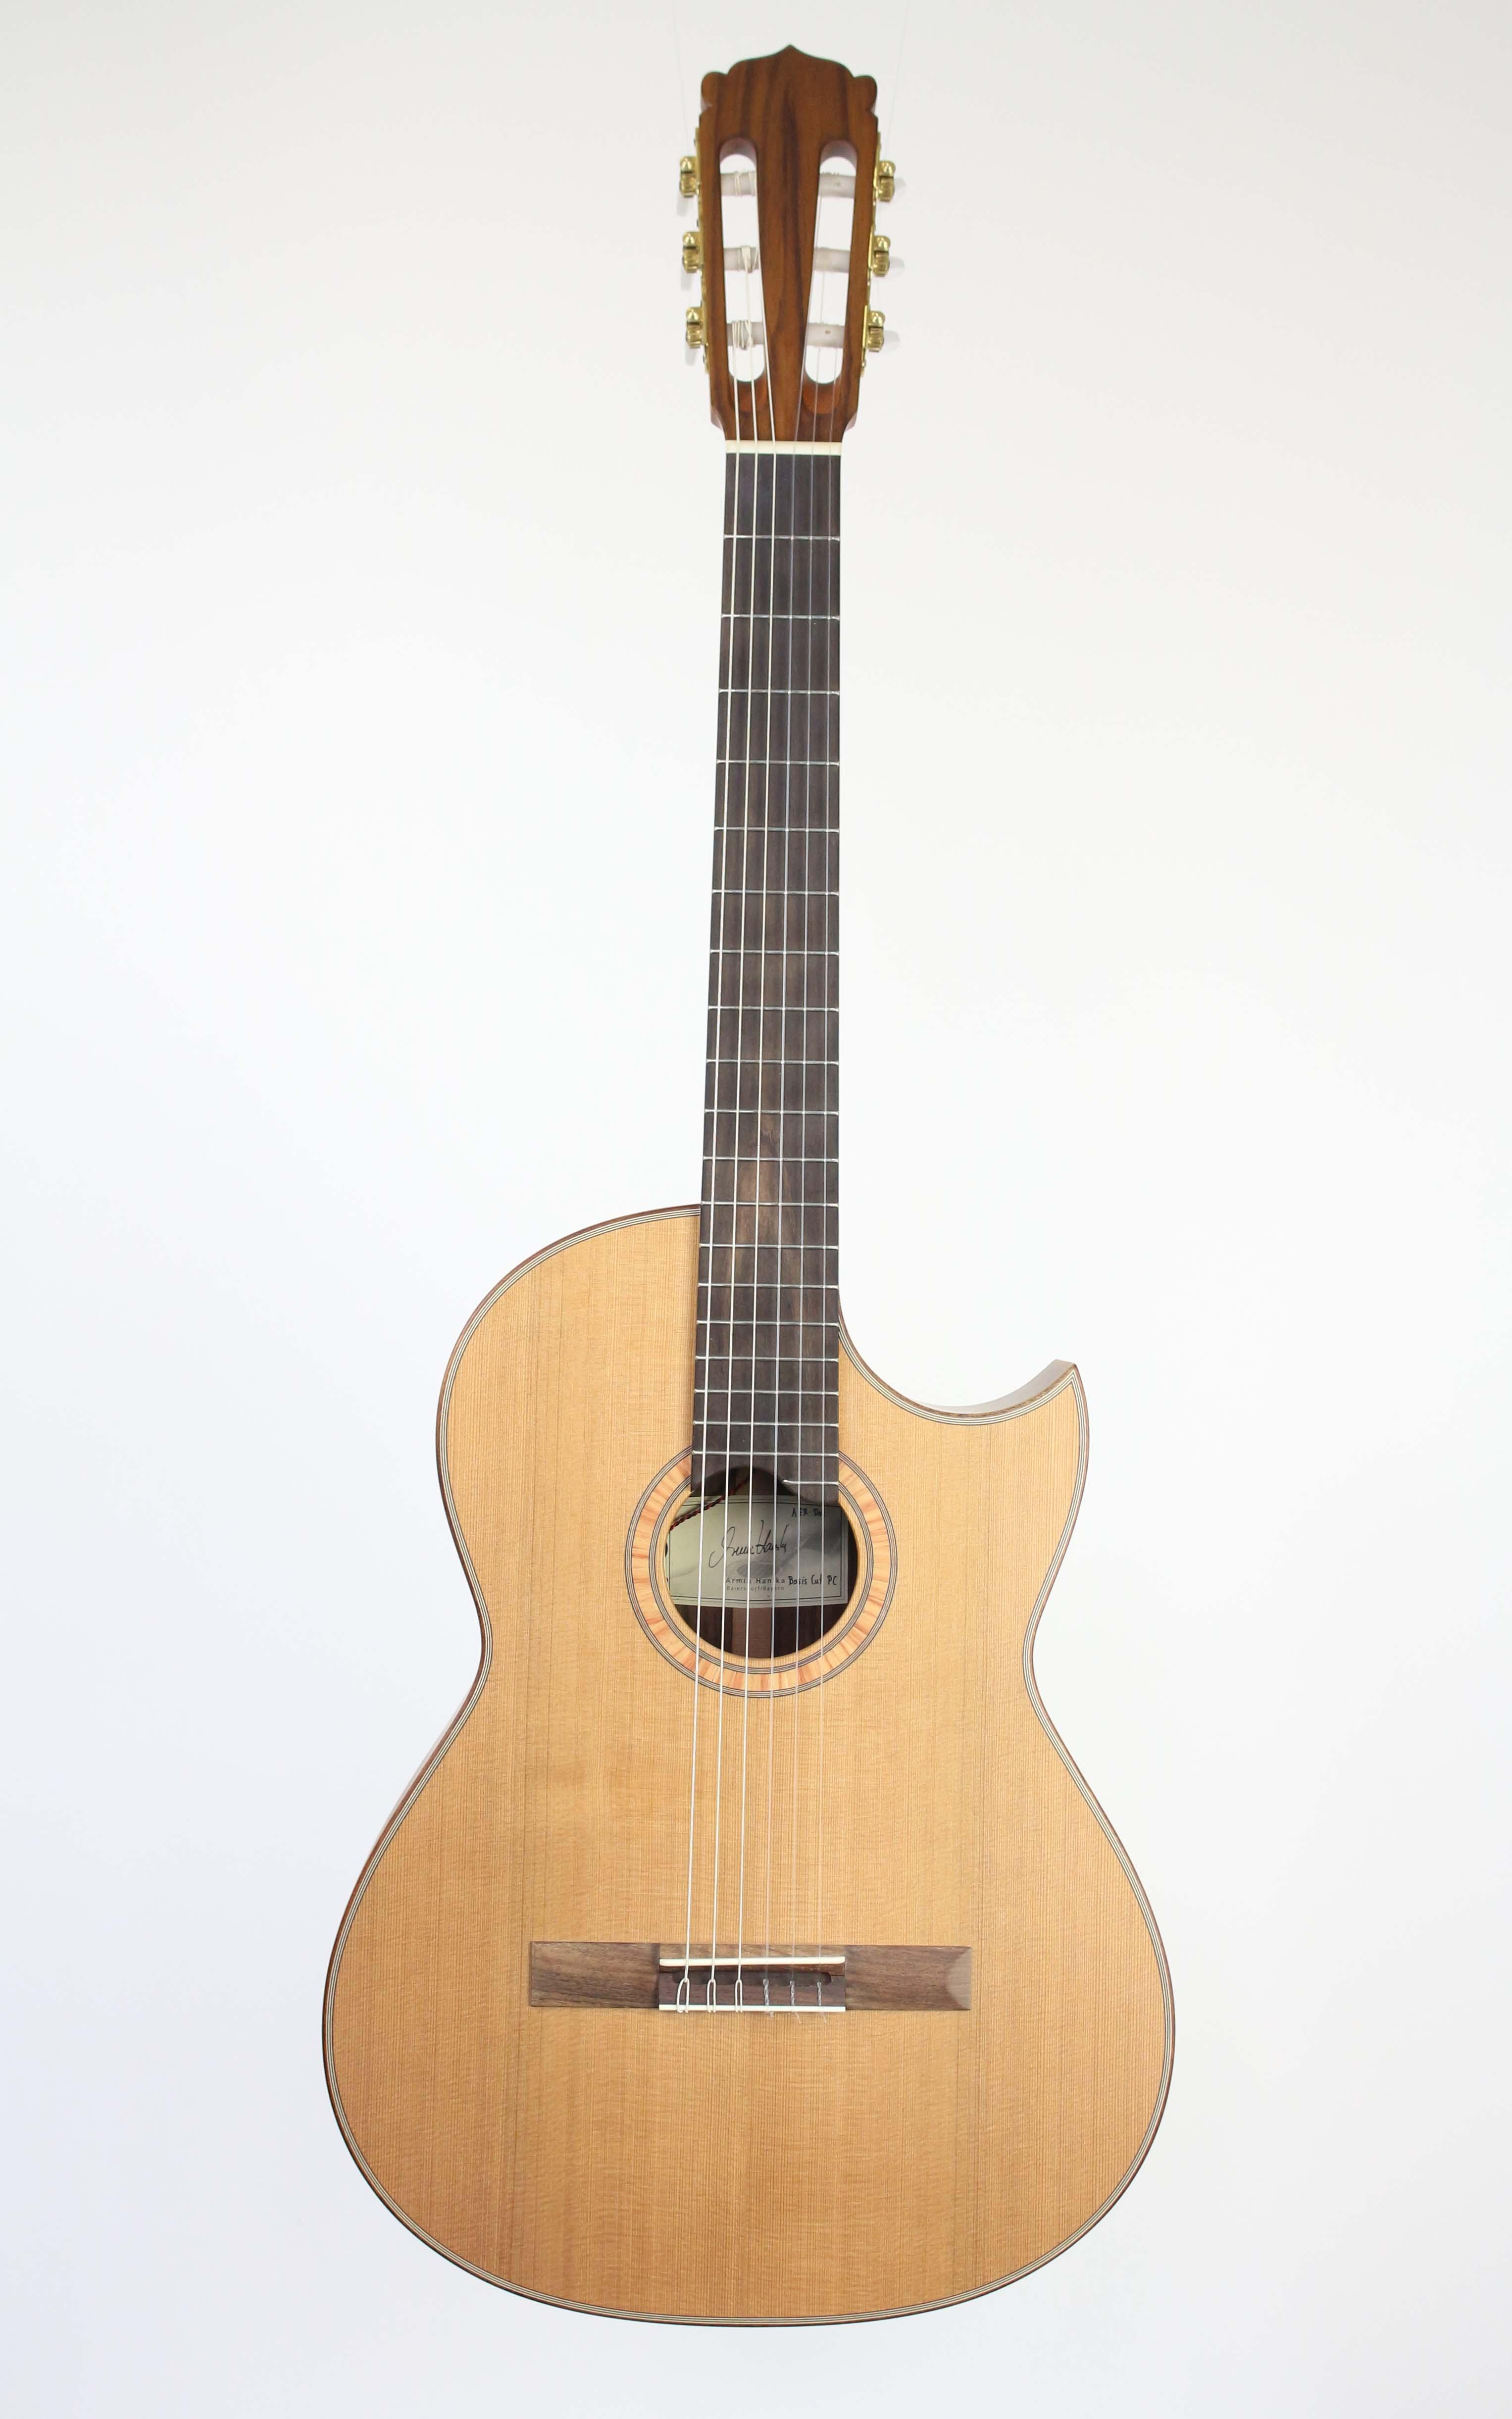 Hanika - Basic Cut PC Udo Rösner Design DOT Pickup - Gitarren - Konzertgitarren | MUSIK BERTRAM Deutschland Freiburg